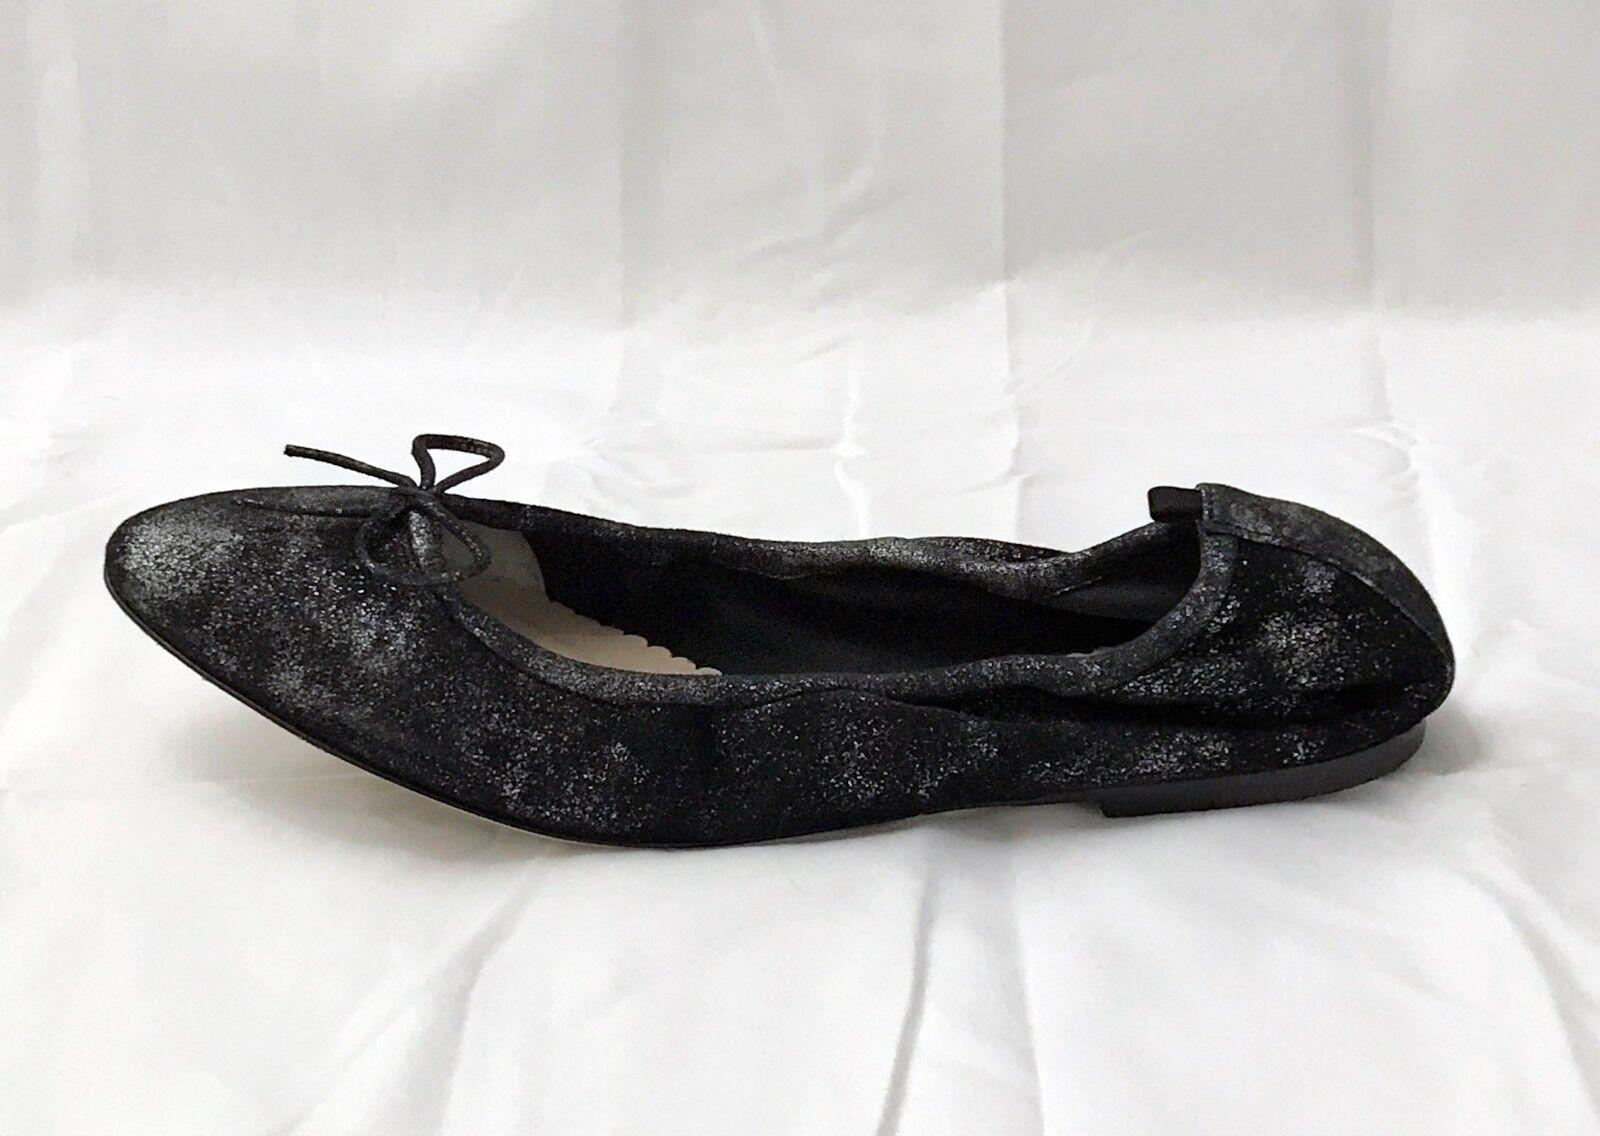 SJP Sarah J Parker Ballet  scarpe Gelsey Flats Anthracite Suede Dimensione 7.5 EUR 37.5  perfezionare